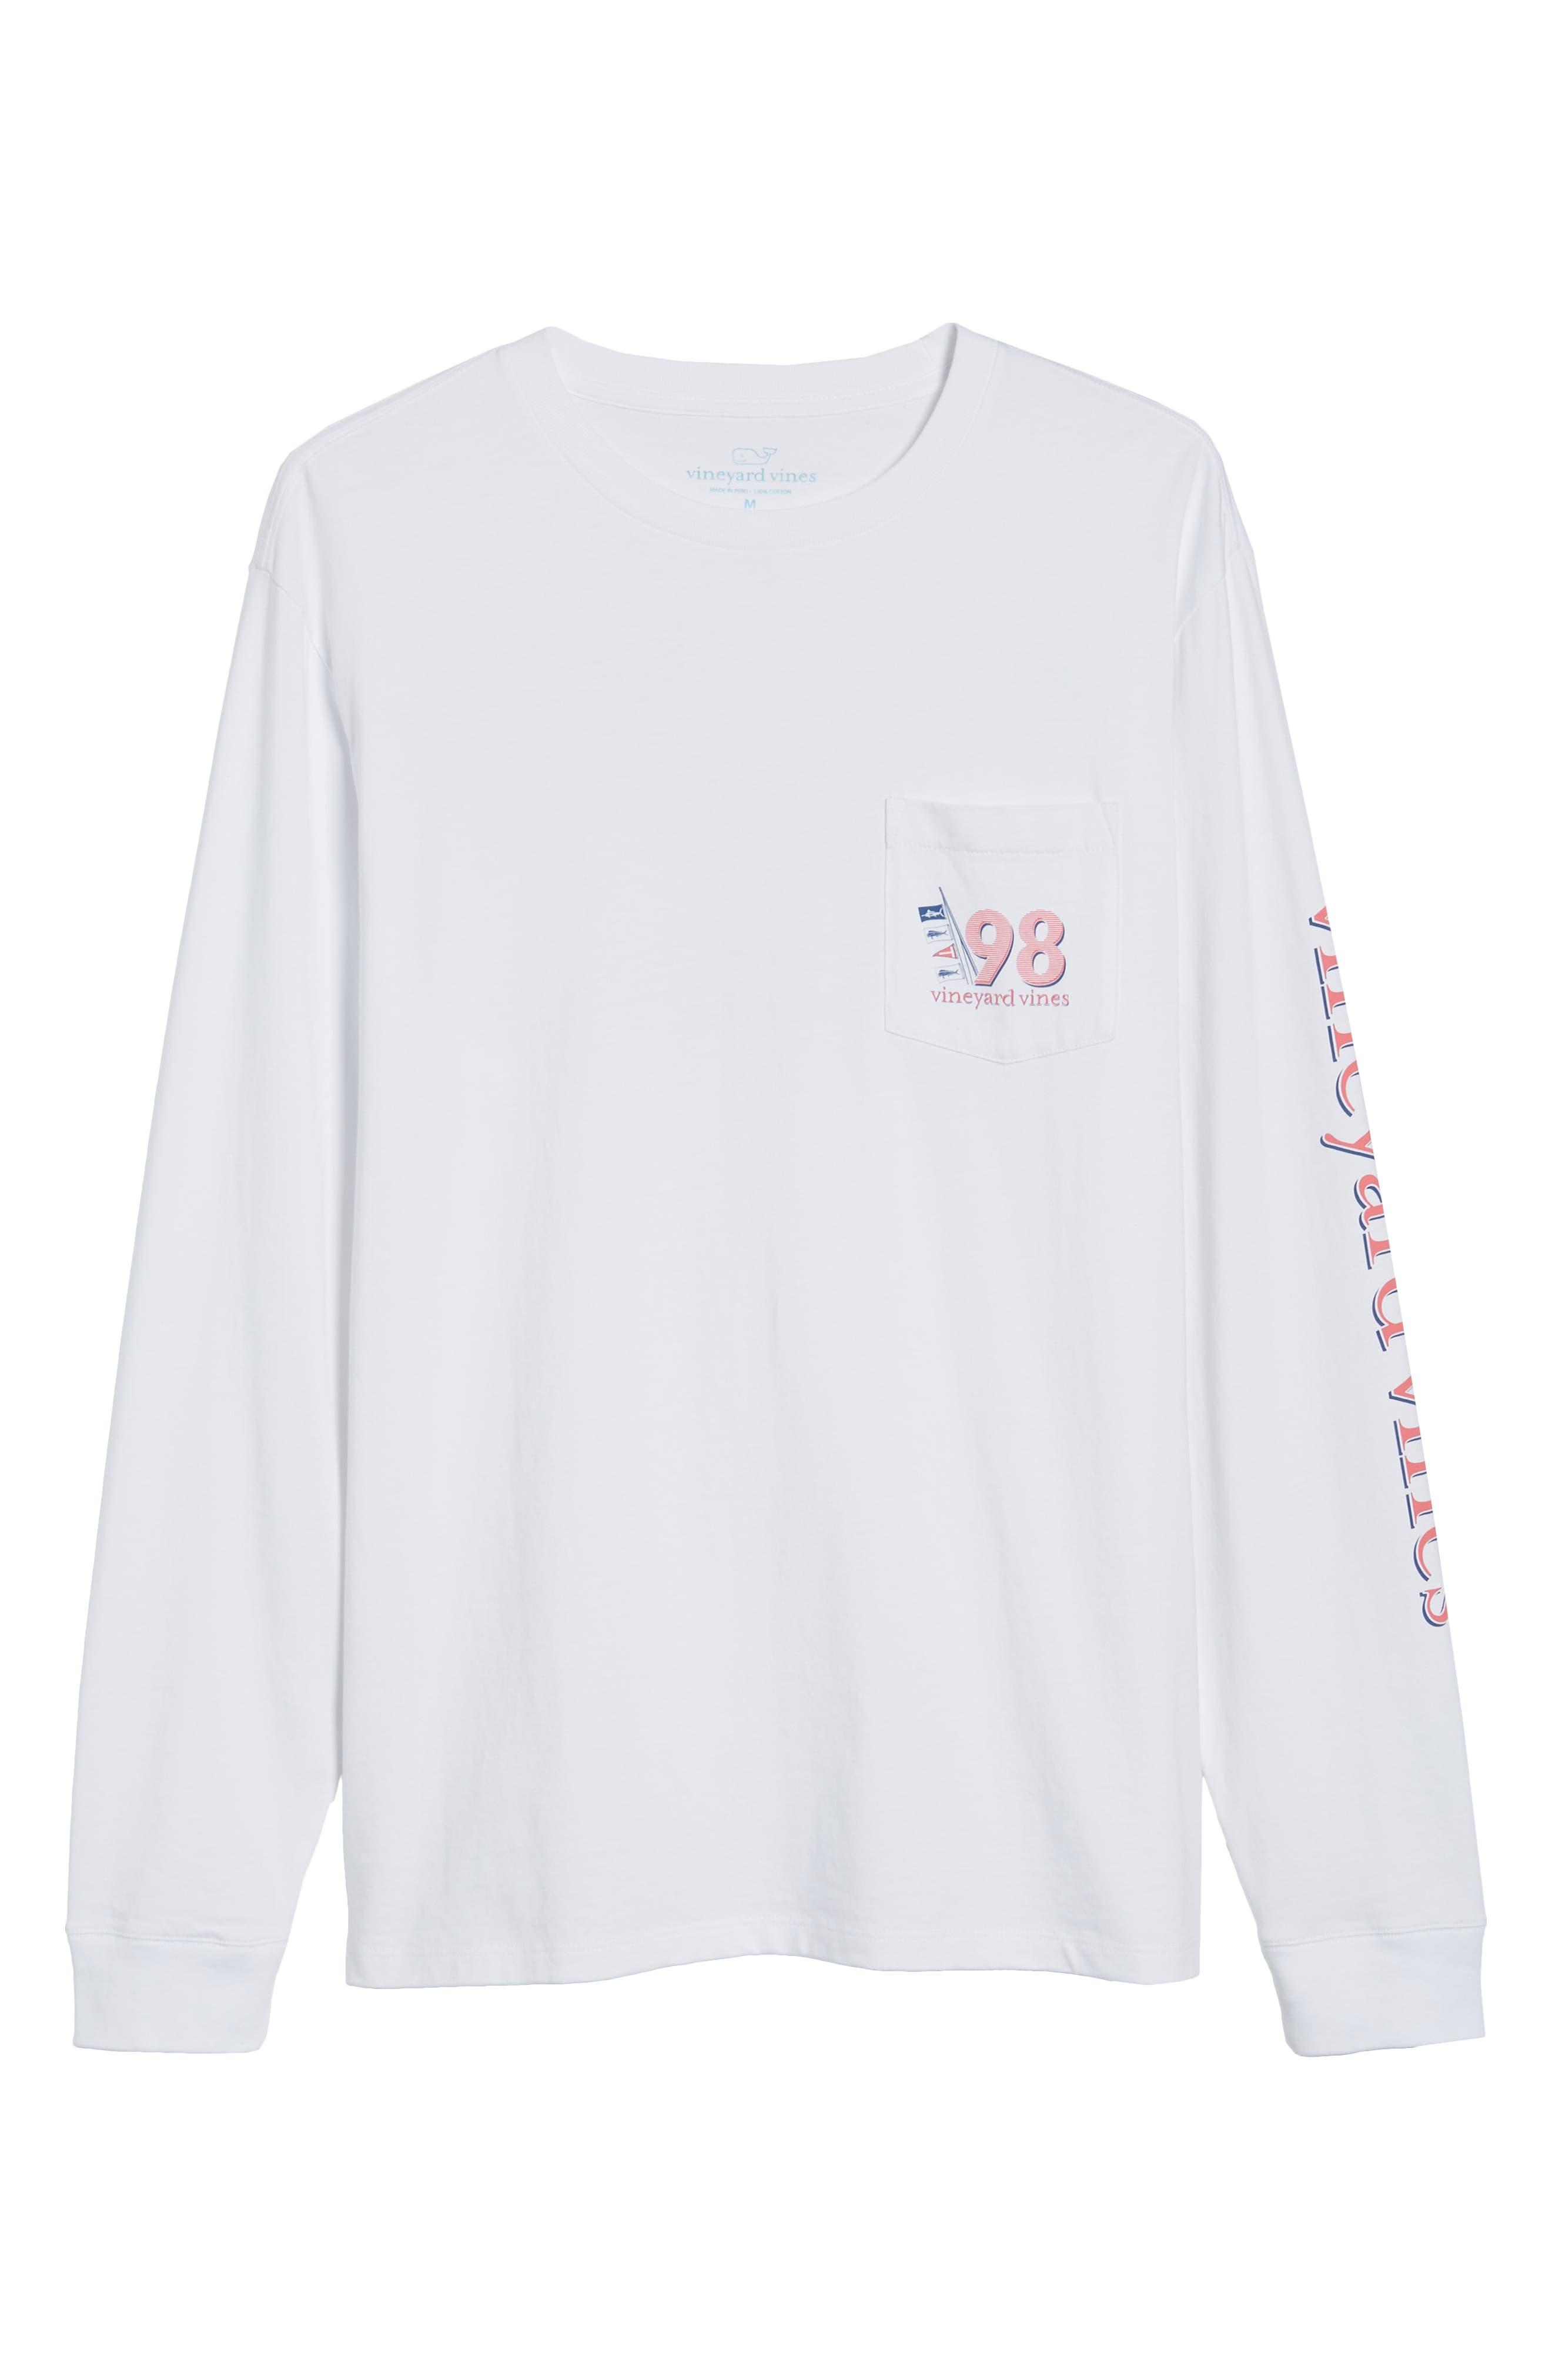 Sportfisher Regular Fit Crewneck T-Shirt,                             Alternate thumbnail 6, color,